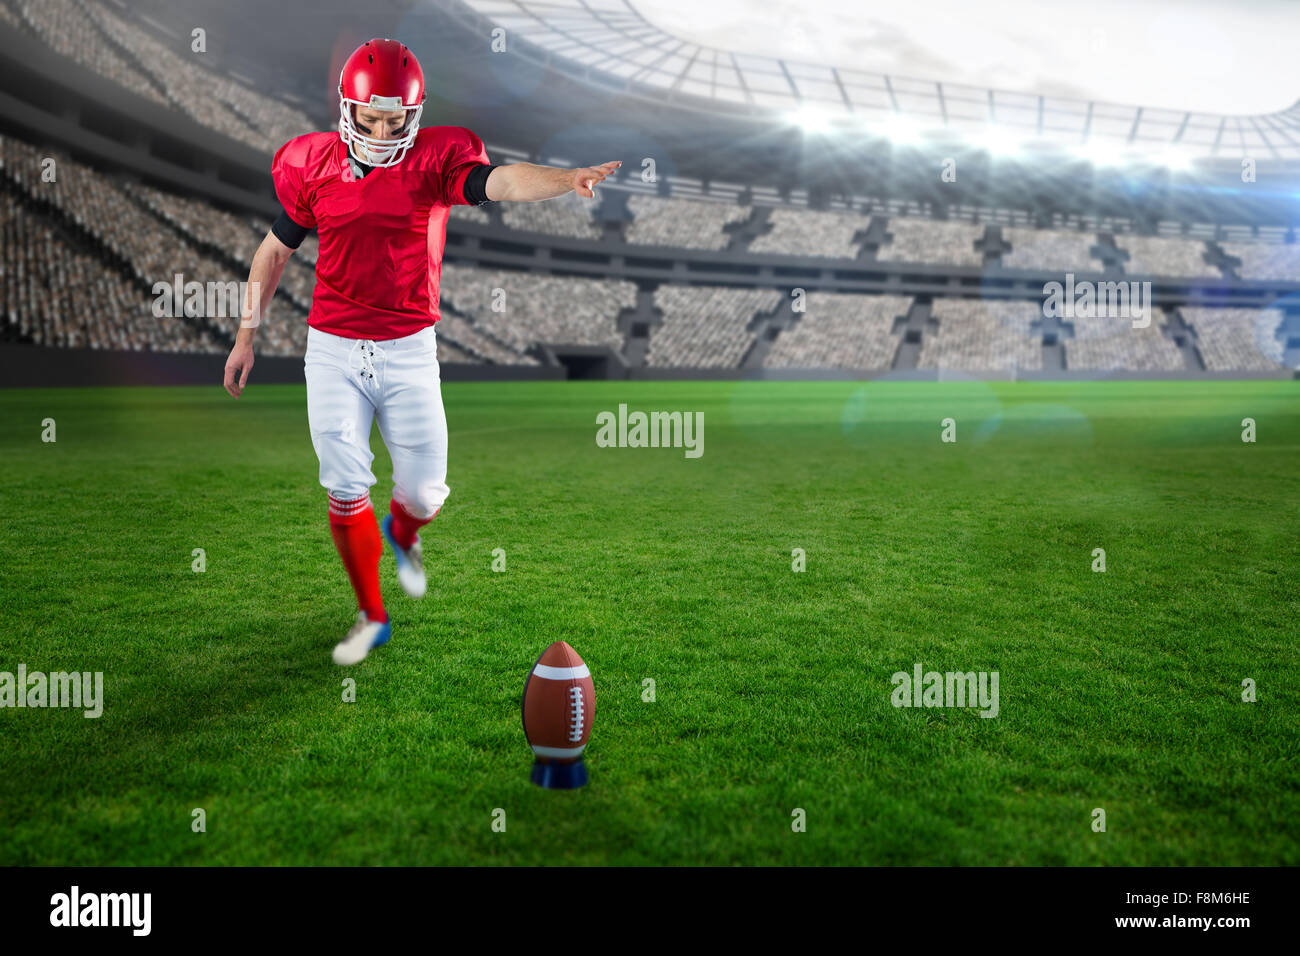 Image composite de l'american football player kicking football Photo Stock